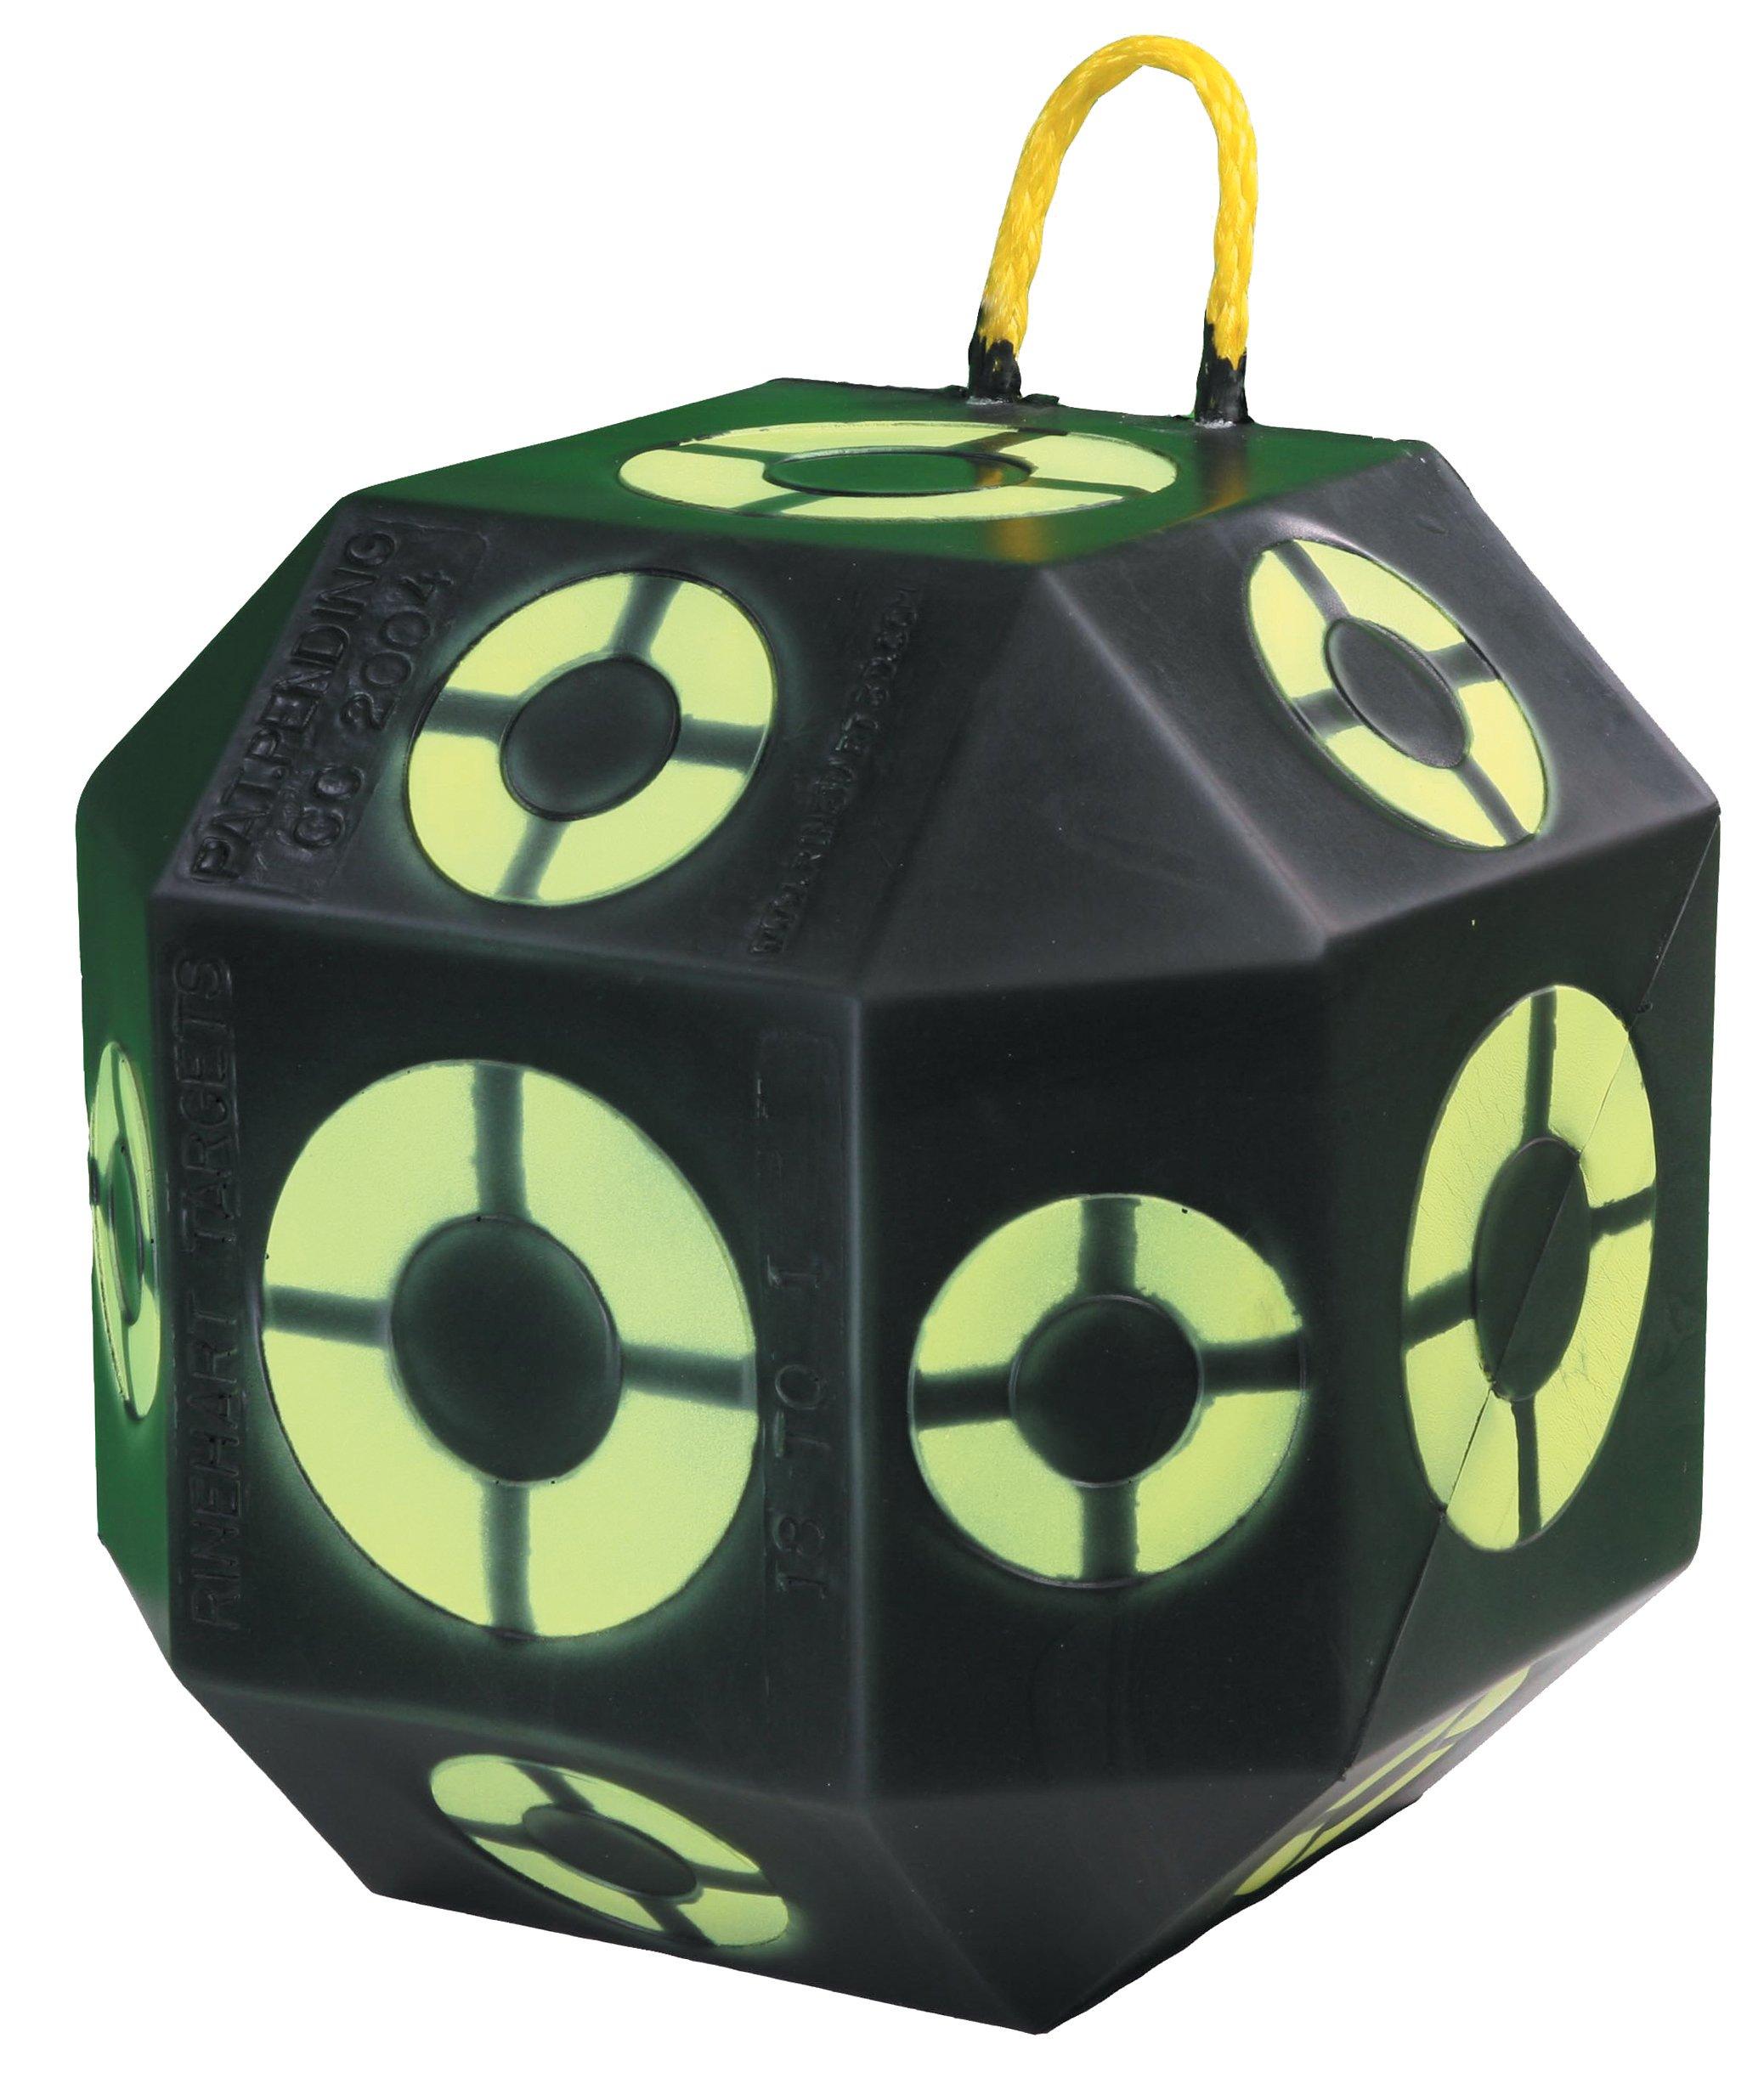 Rinehart Targets Cube 18-1 Schießwürfel